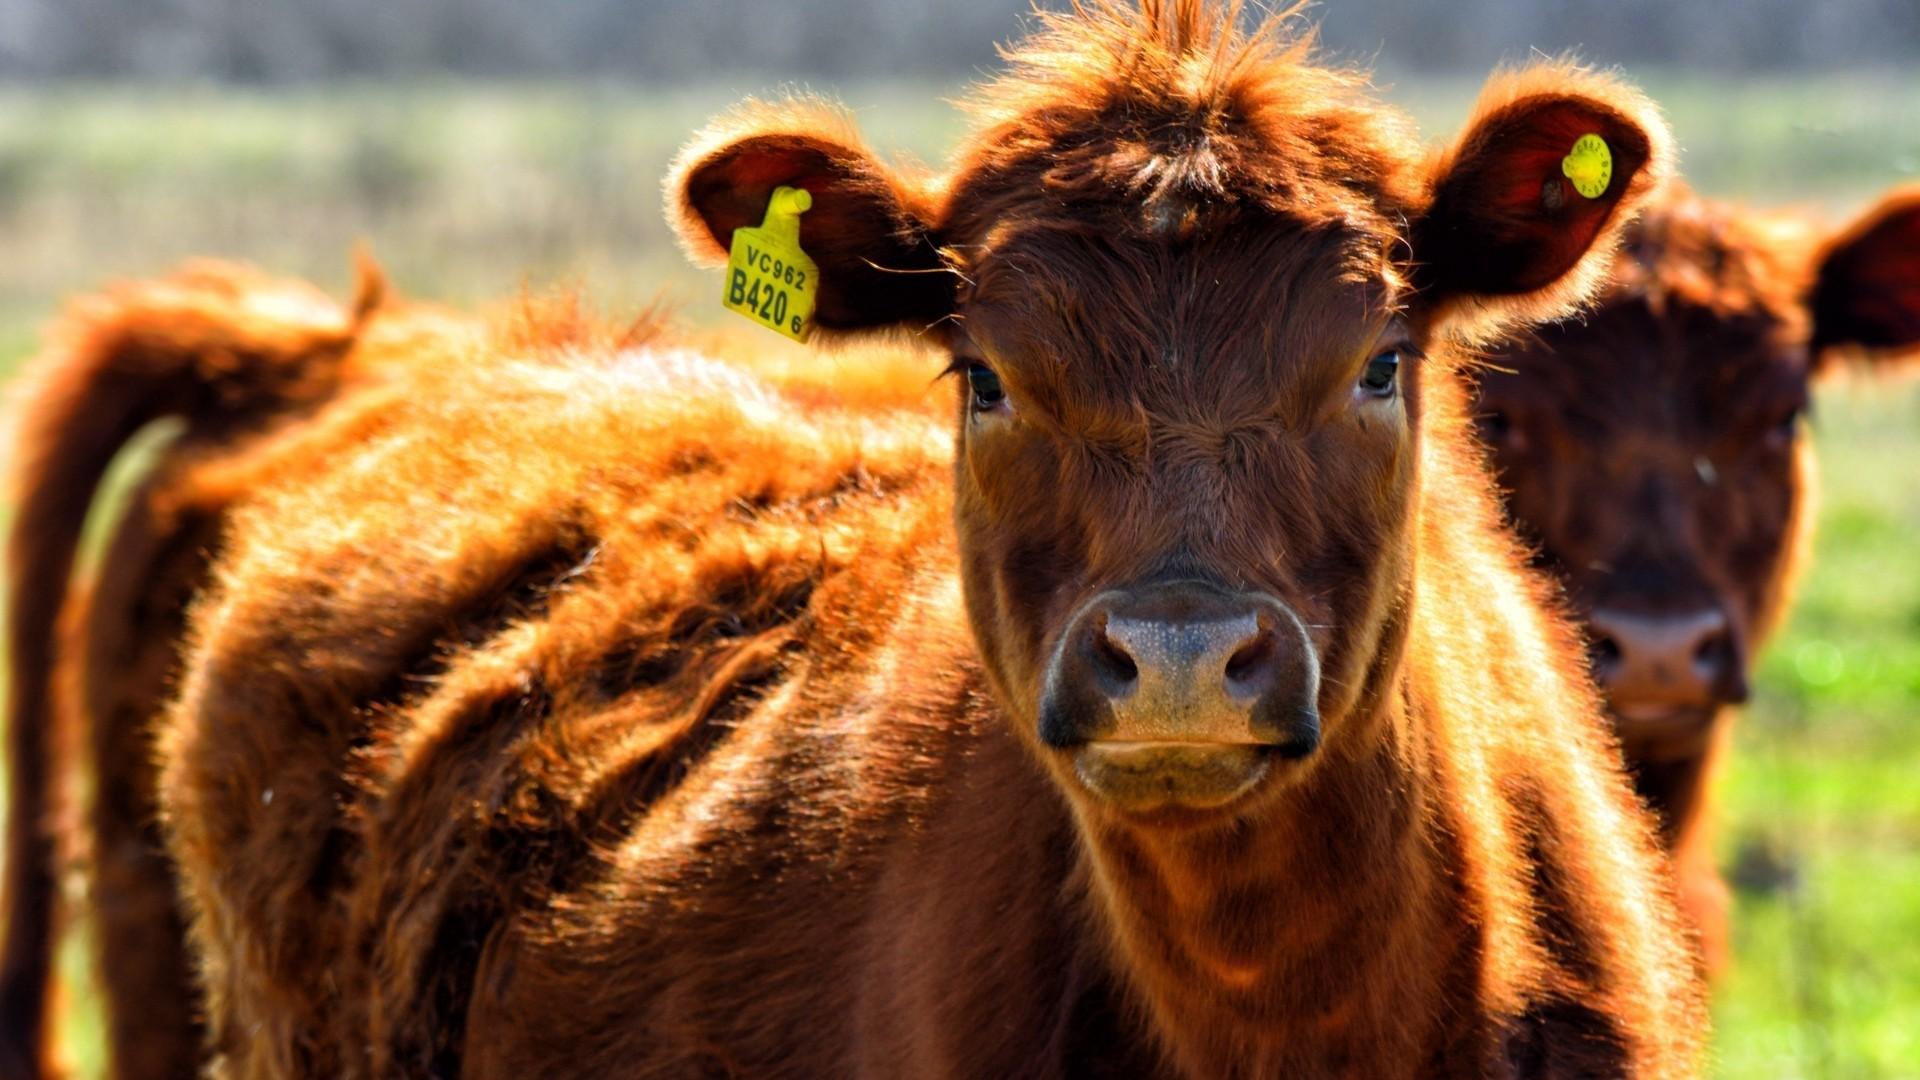 Cow Full HD Wallpaper